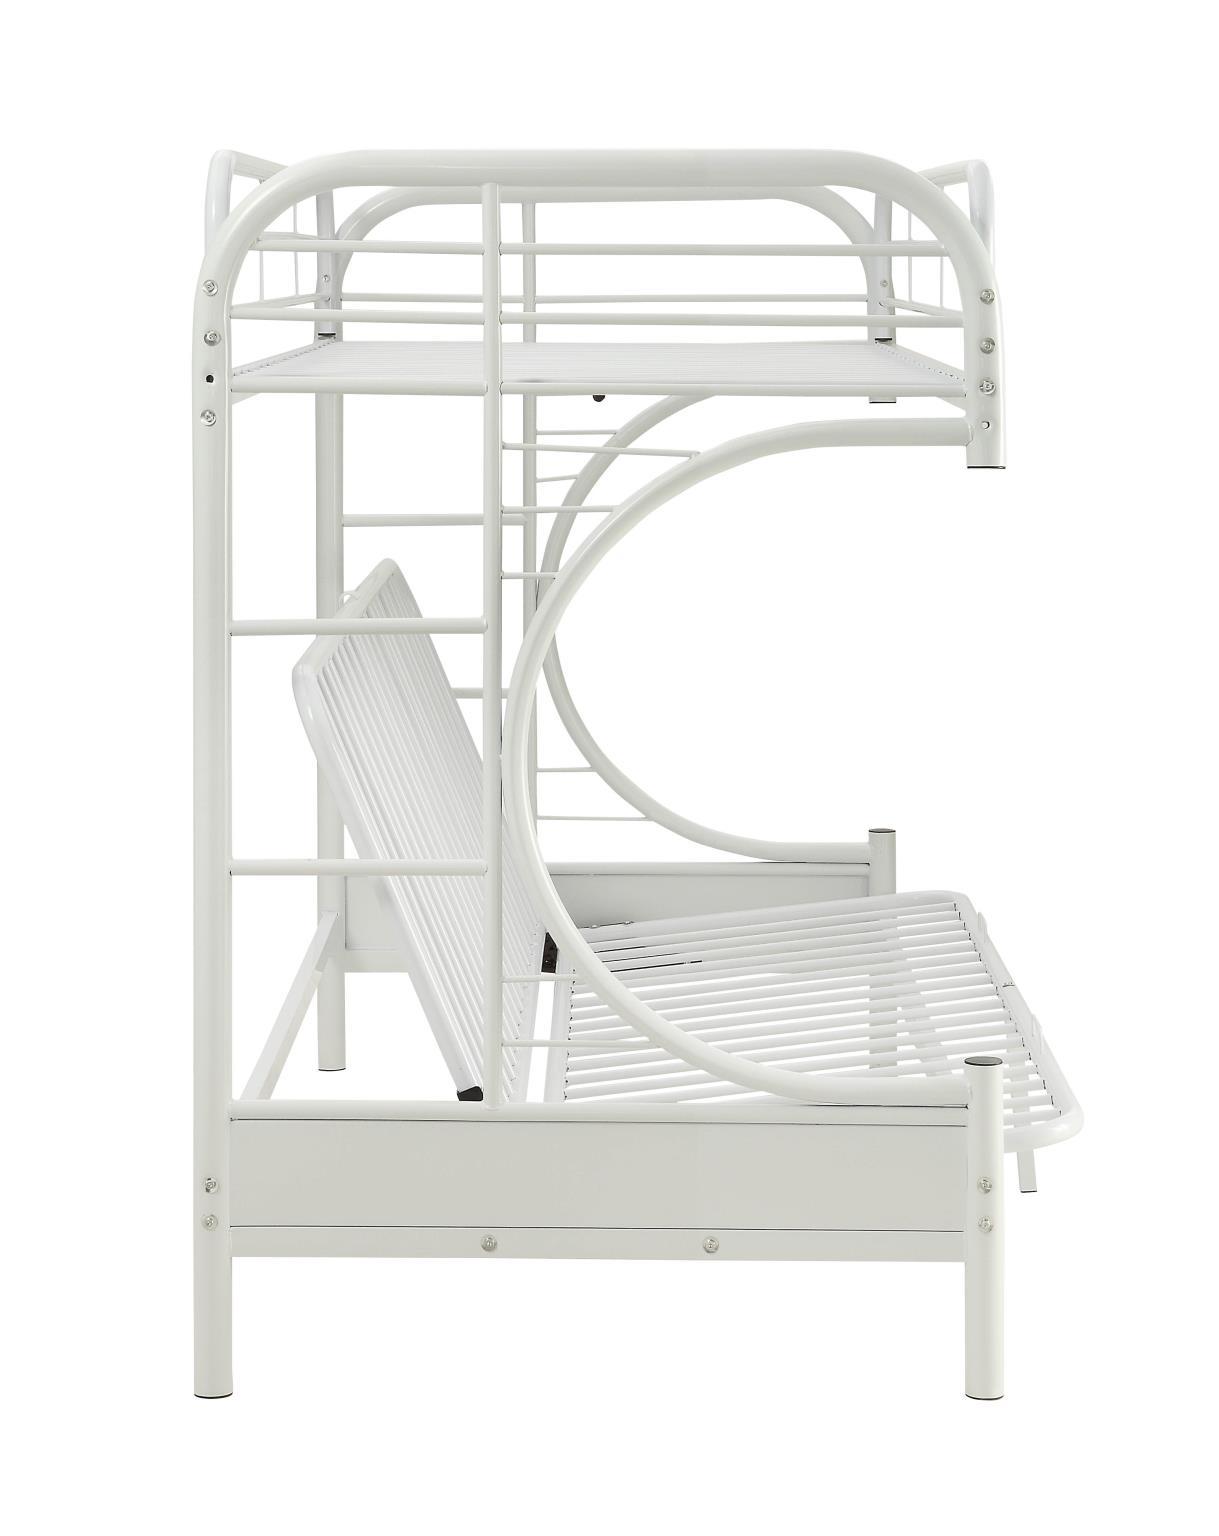 White Twin XL/Queen Futon Bunk Bed Side